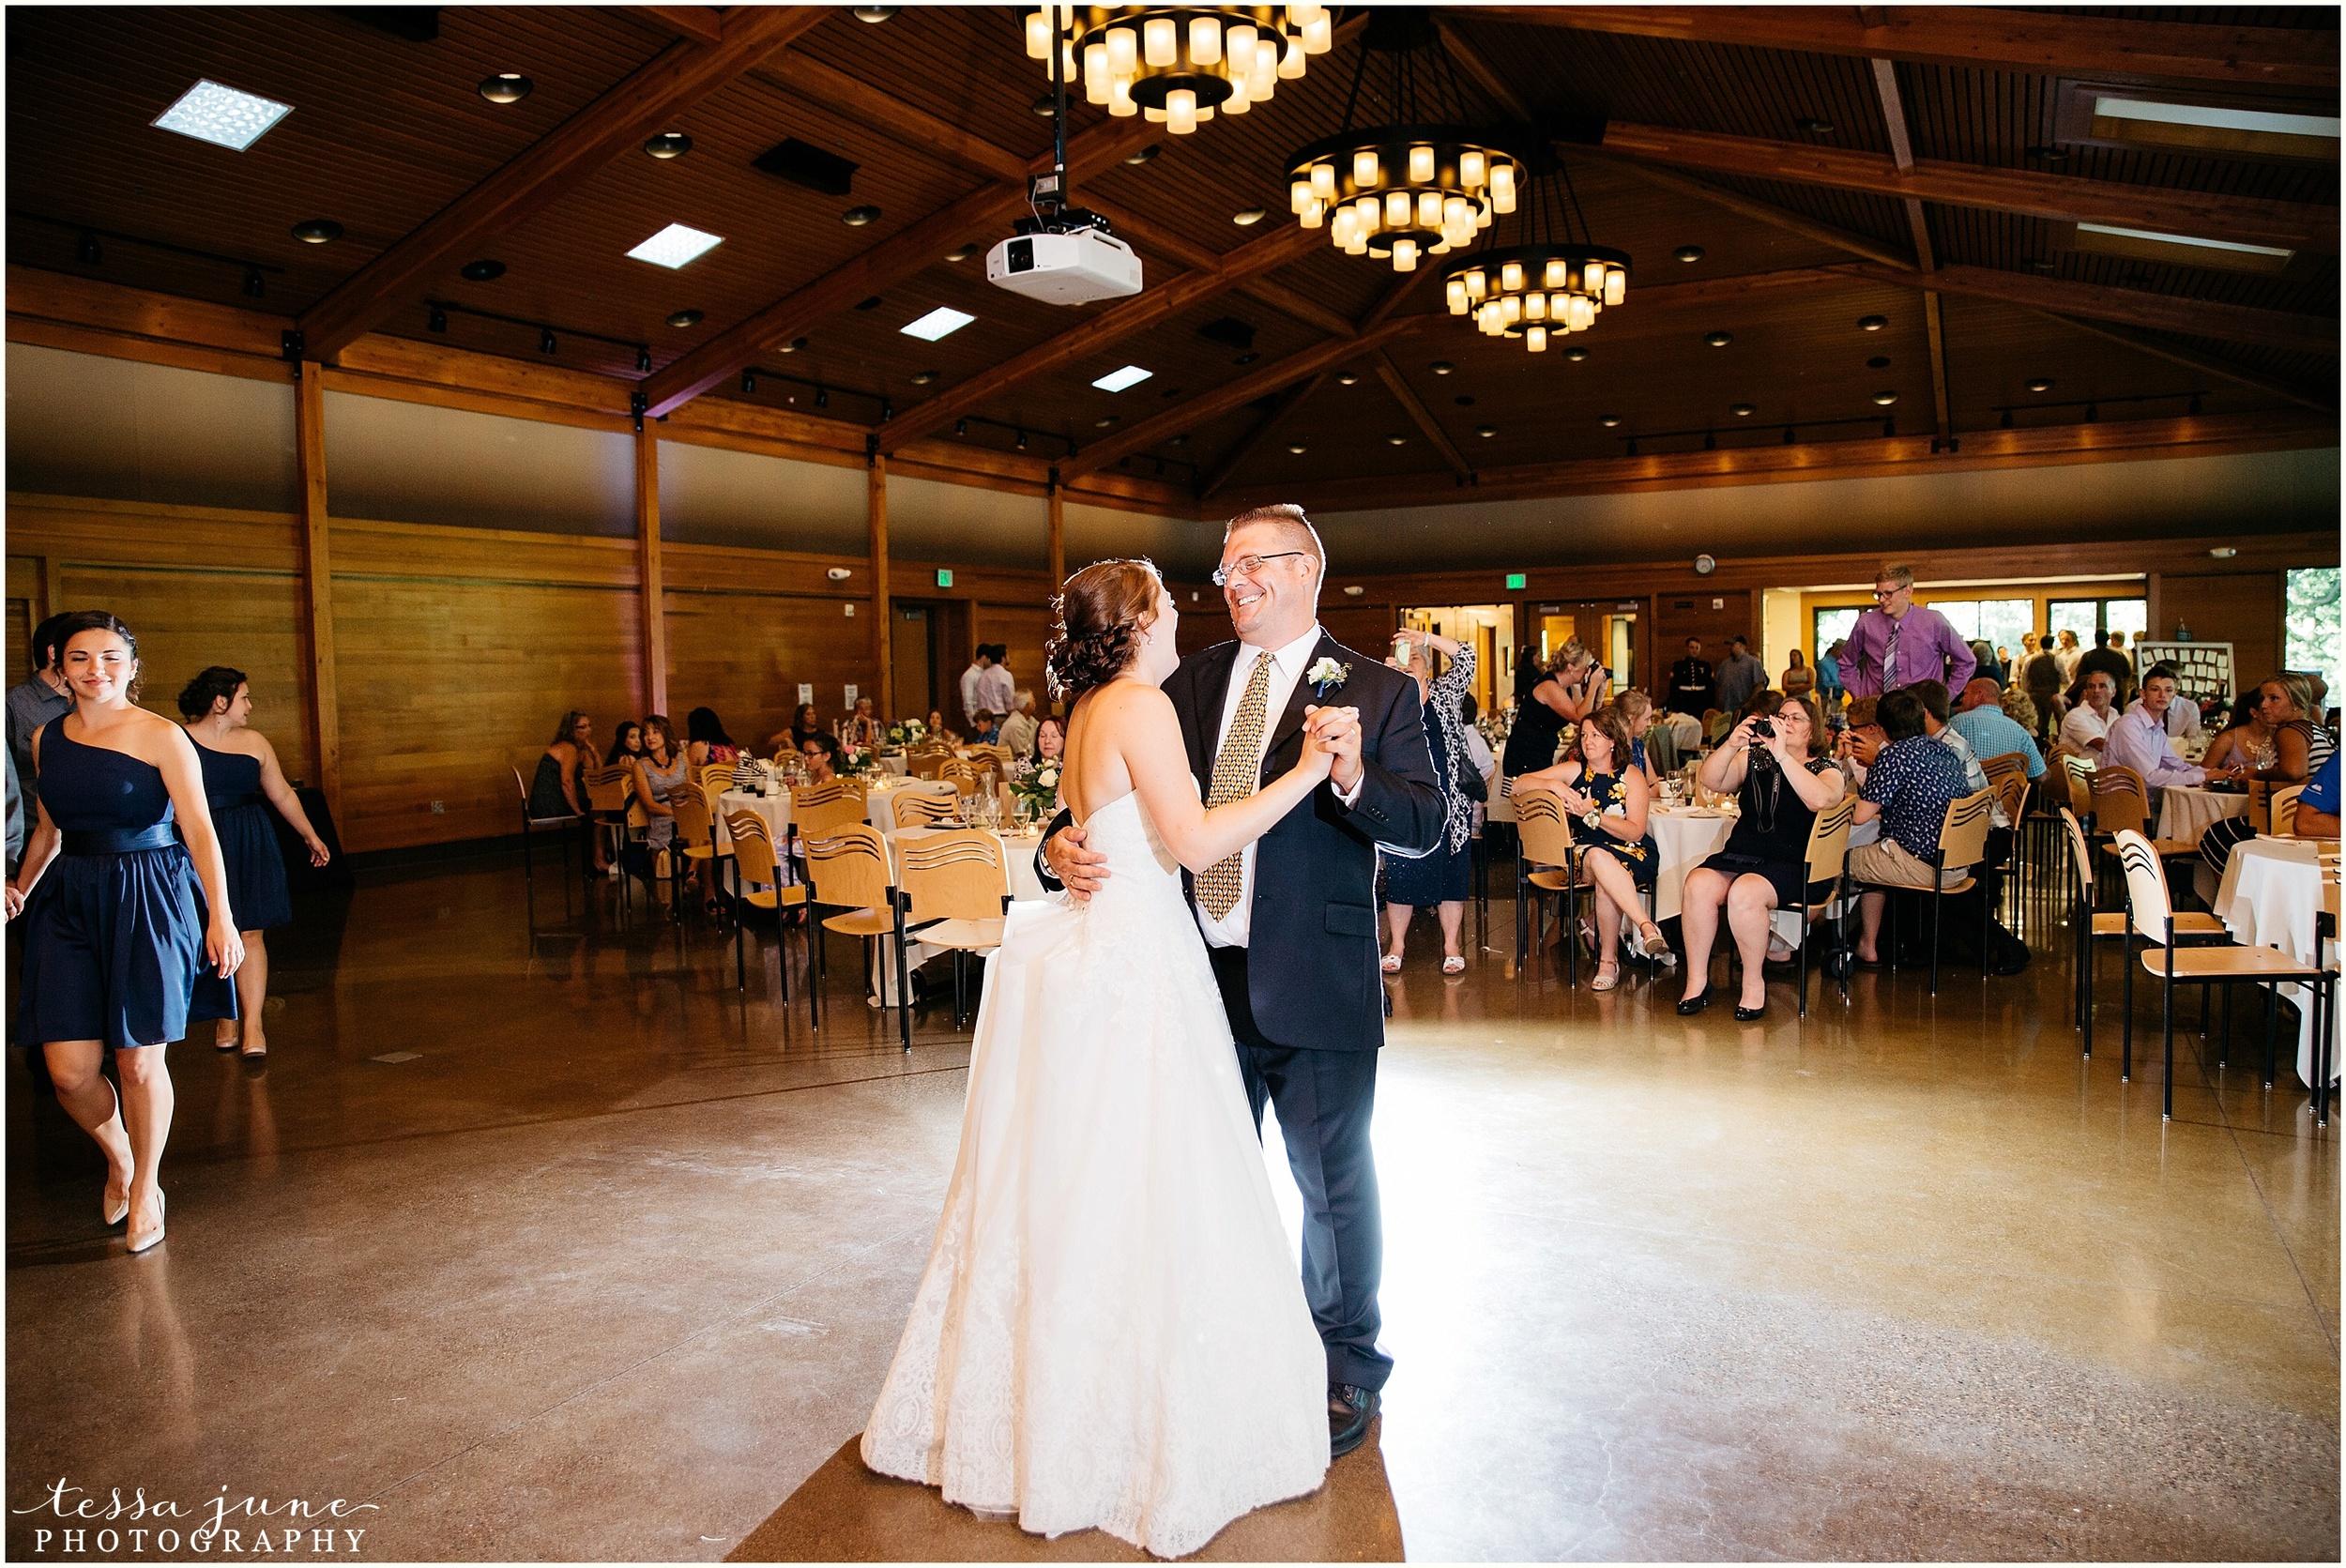 silverwood-park-st-anthony-wedding-minnesota-st-cloud-photographer